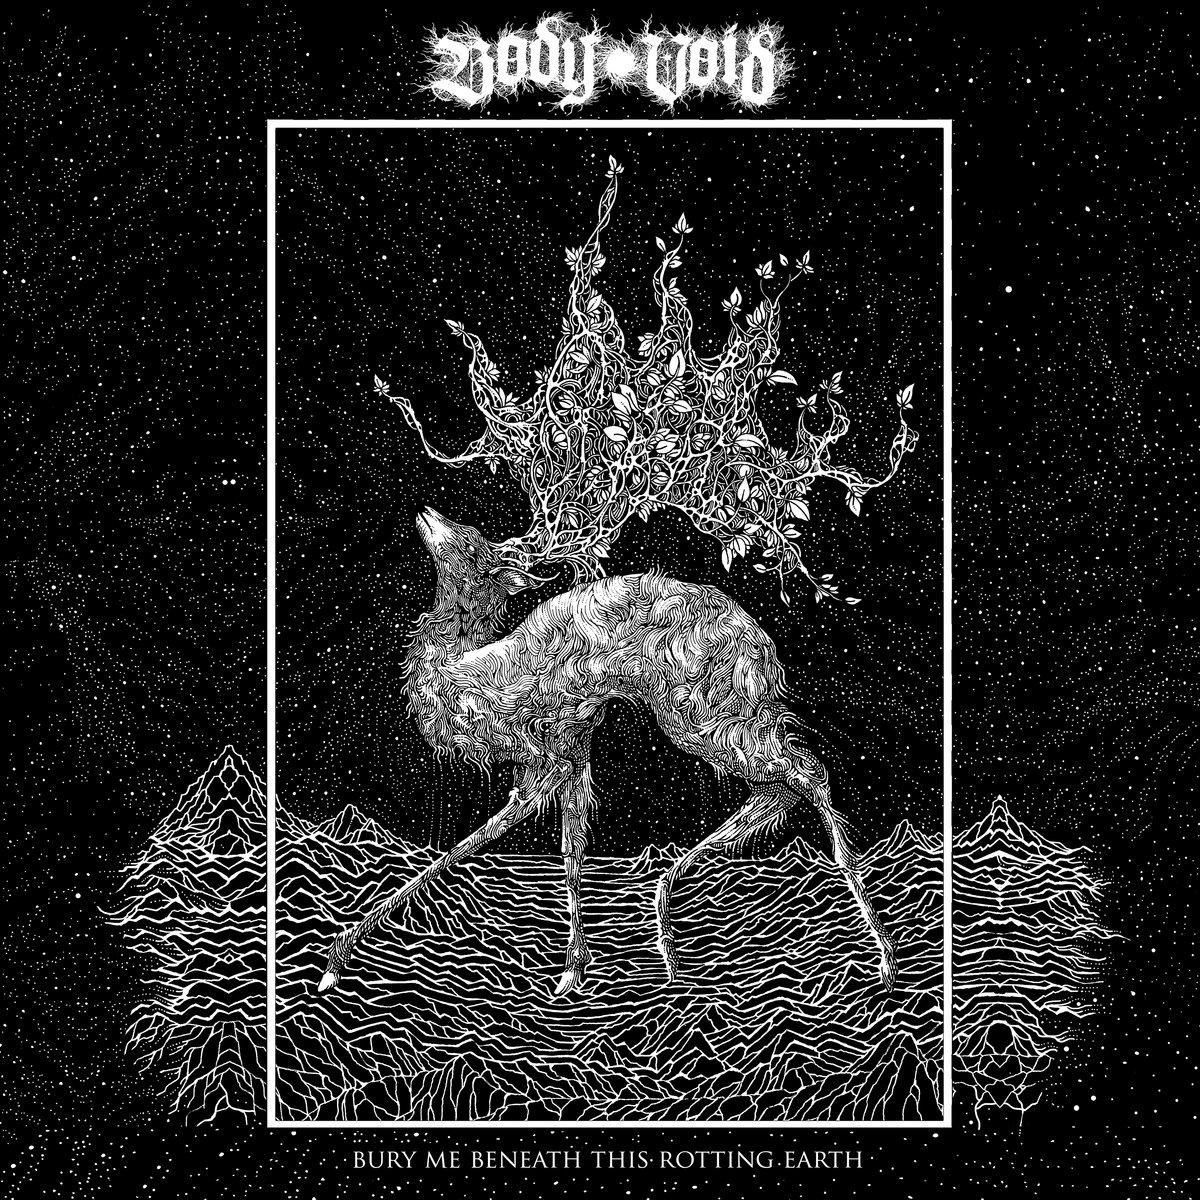 Bury Me Beneath This Rotting Earth Body Void Album Cover Artwork